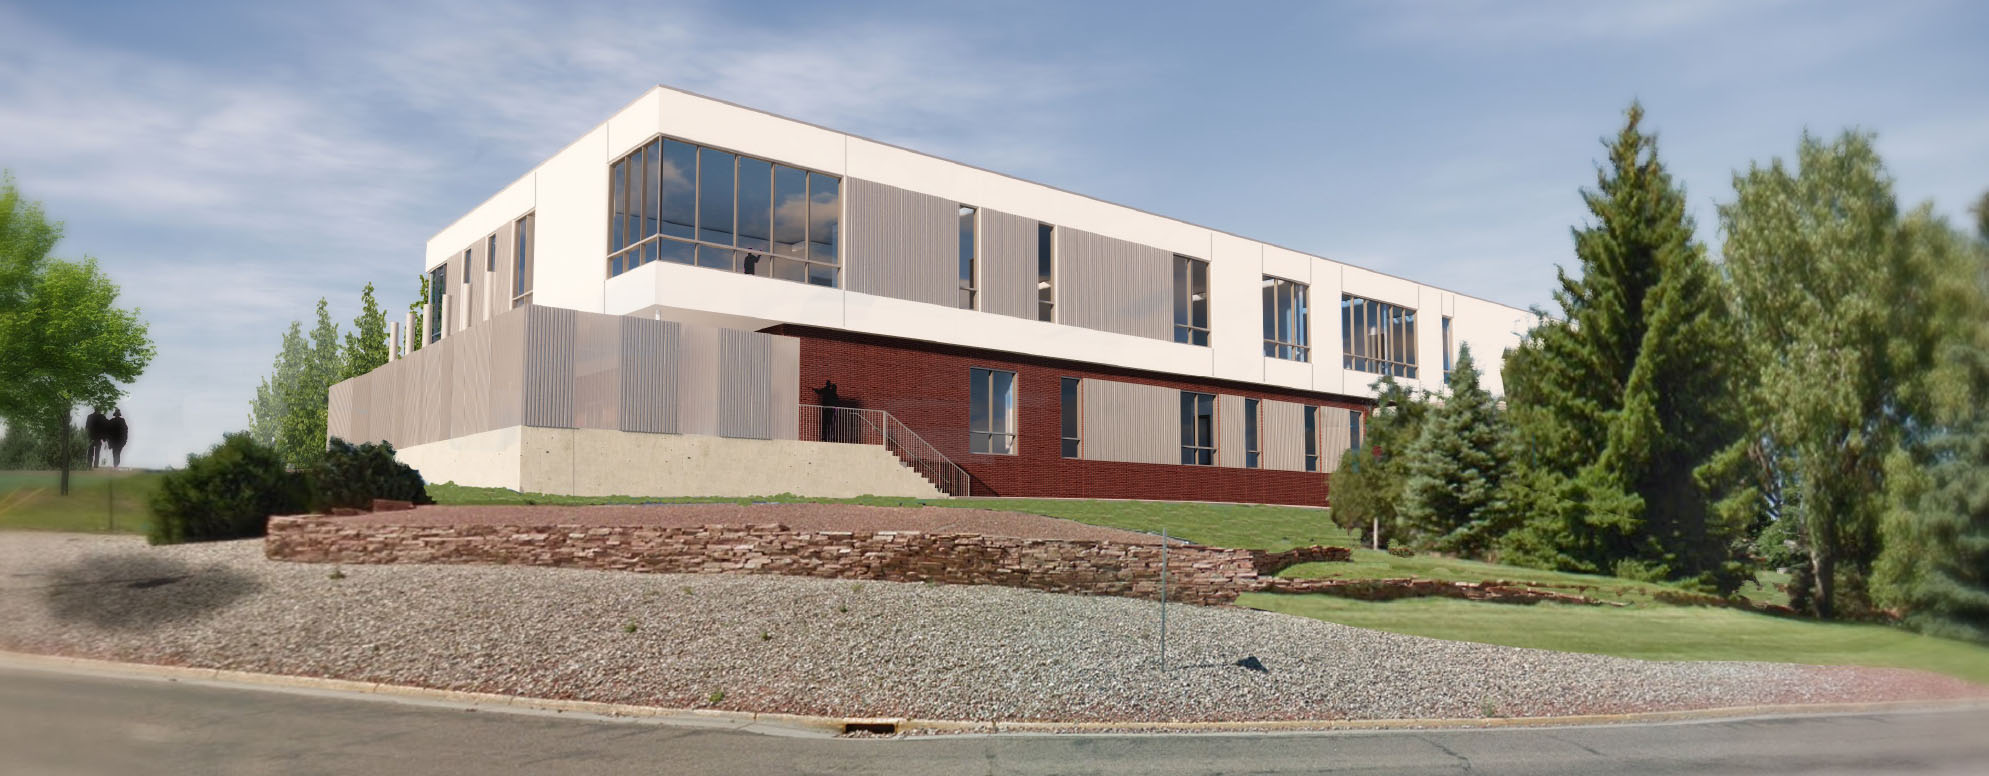 VA Bldg exterior concept image